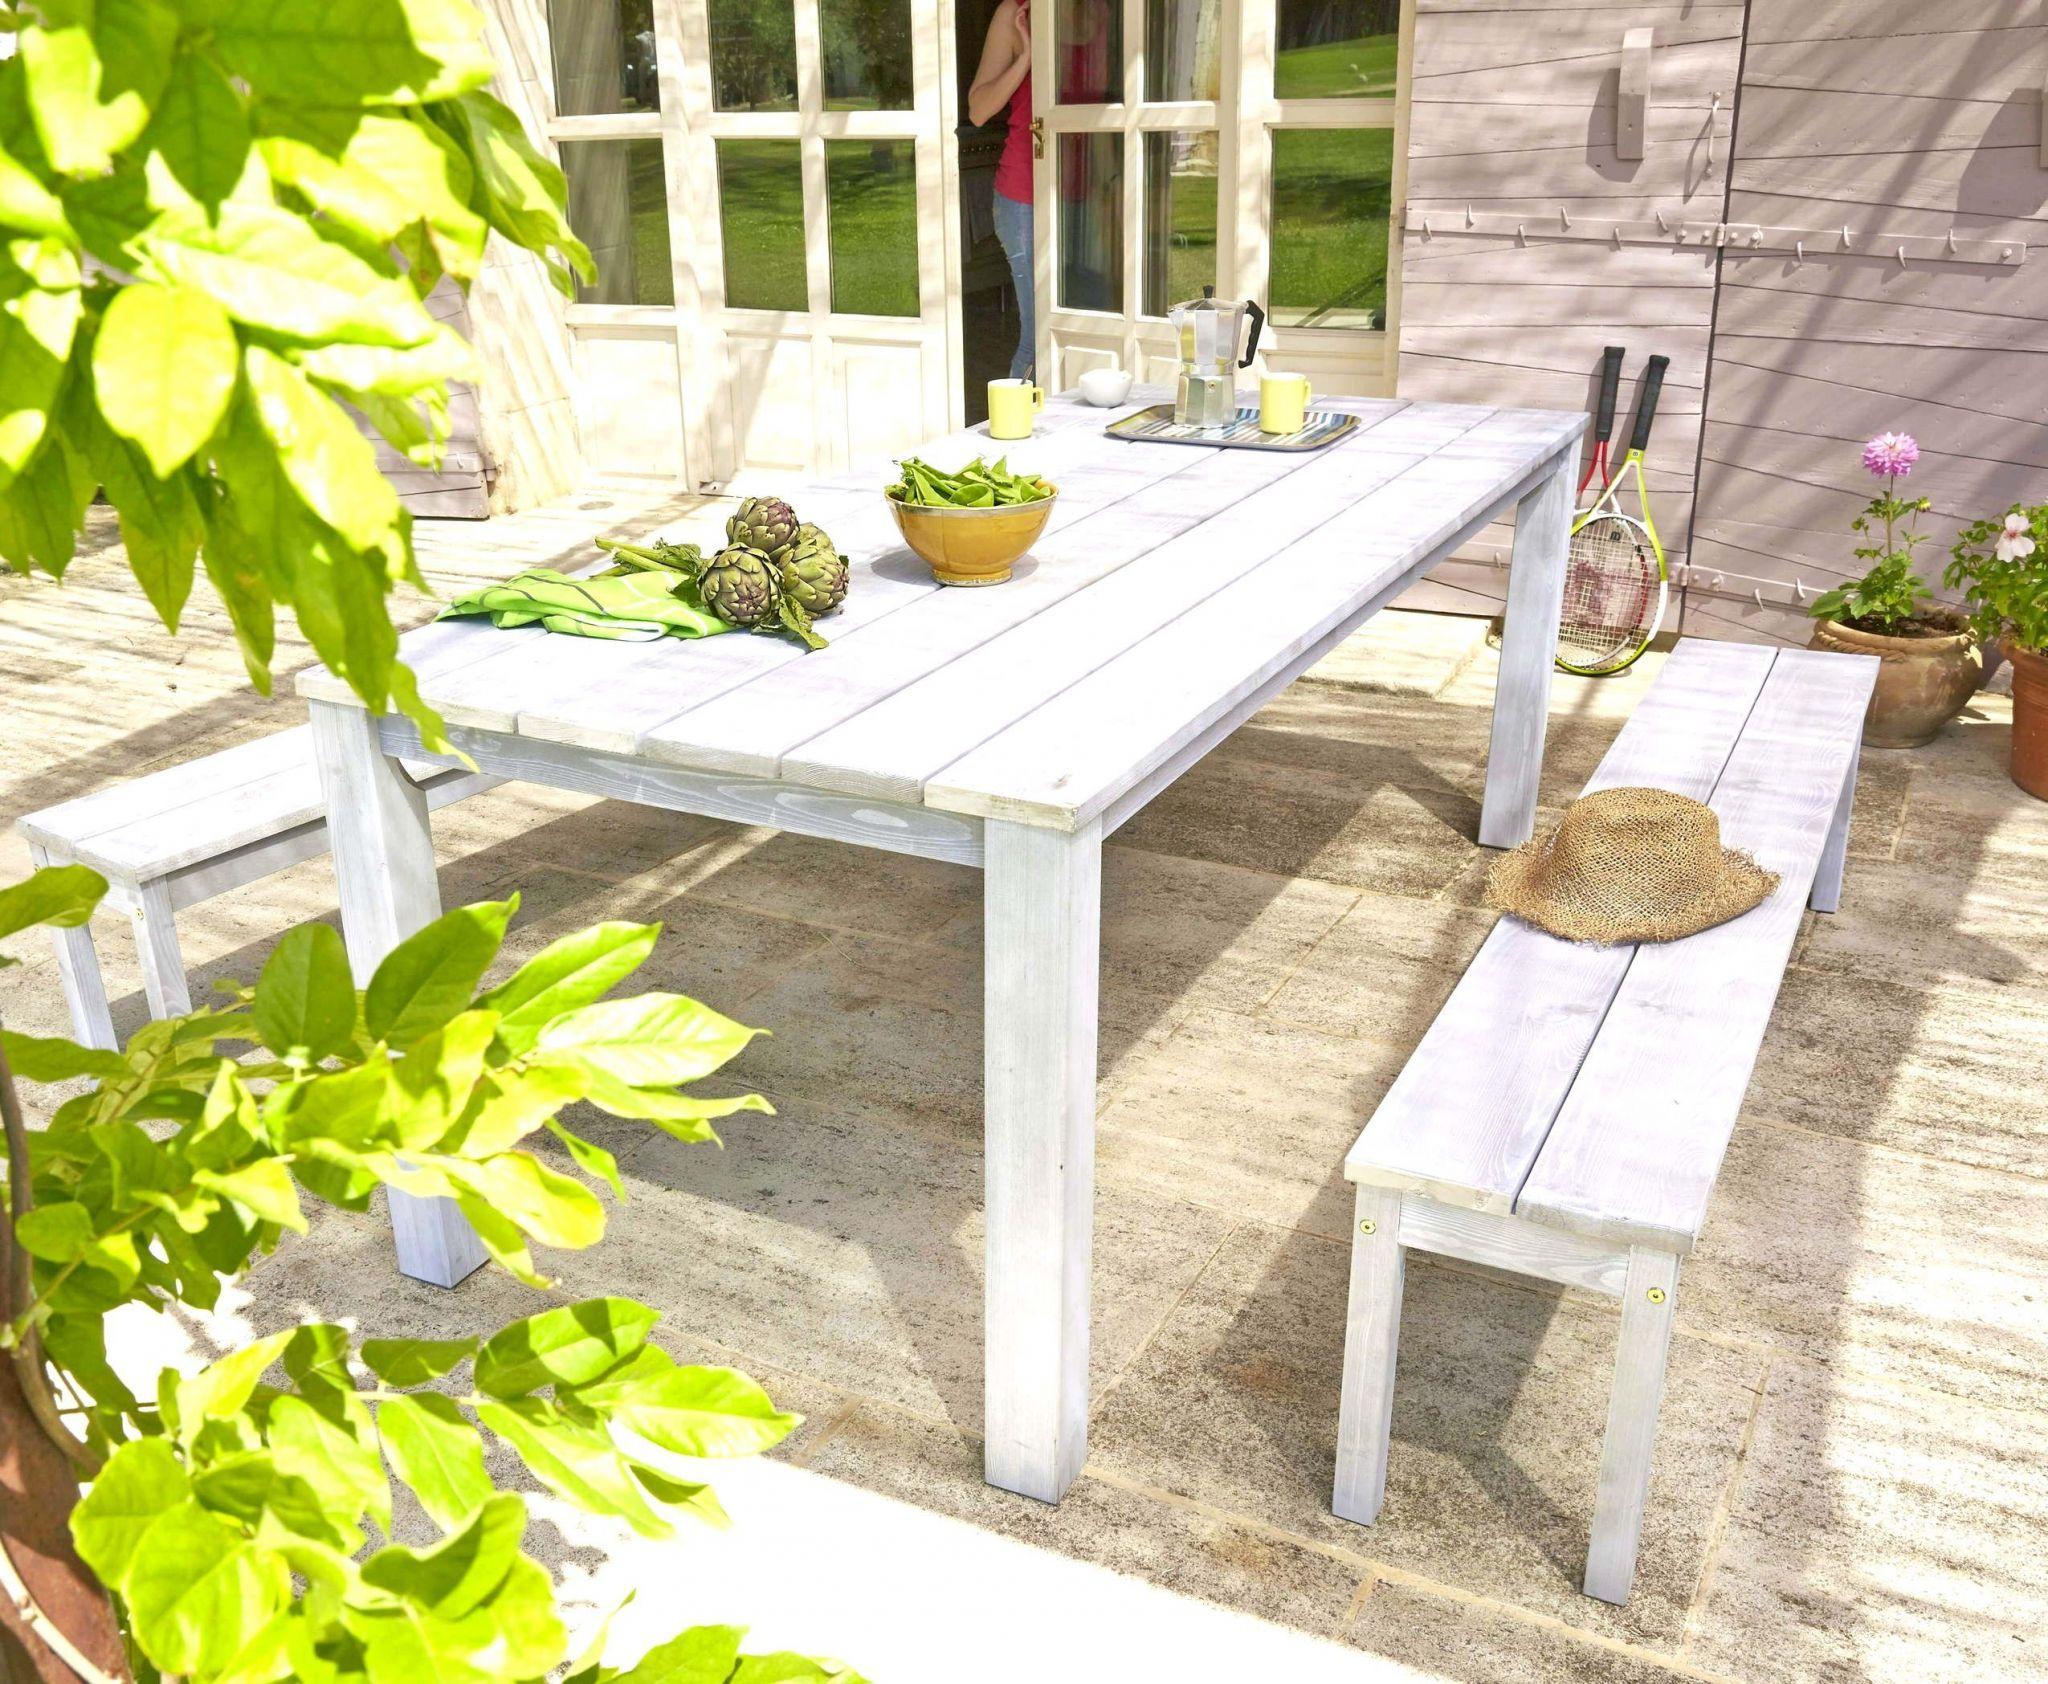 Table Teck Jardin Luxe Table Exterieur 10 Personnes Greatest Table Jardin Teck Luxe Of 59 Frais Table Teck Jardin